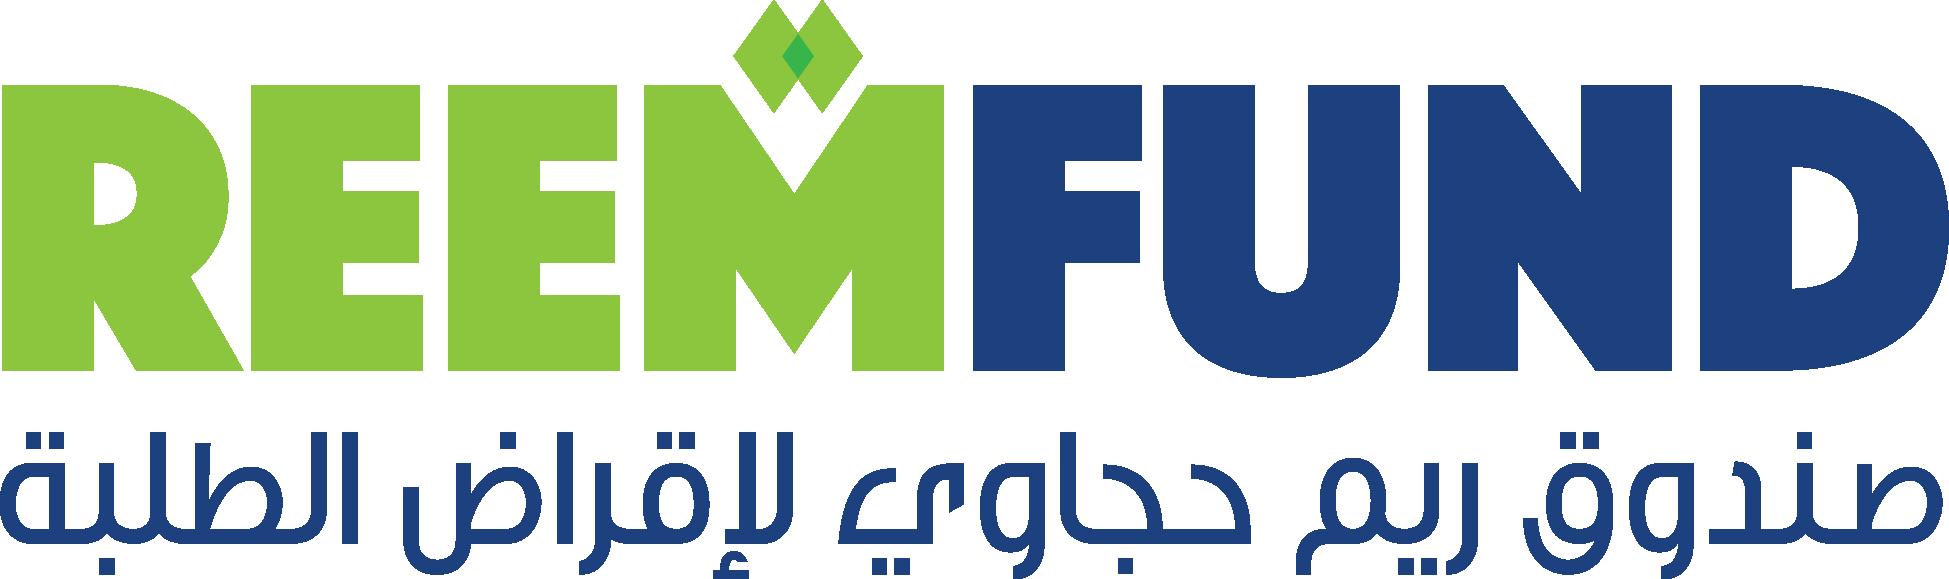 Unify Home Loans Logo